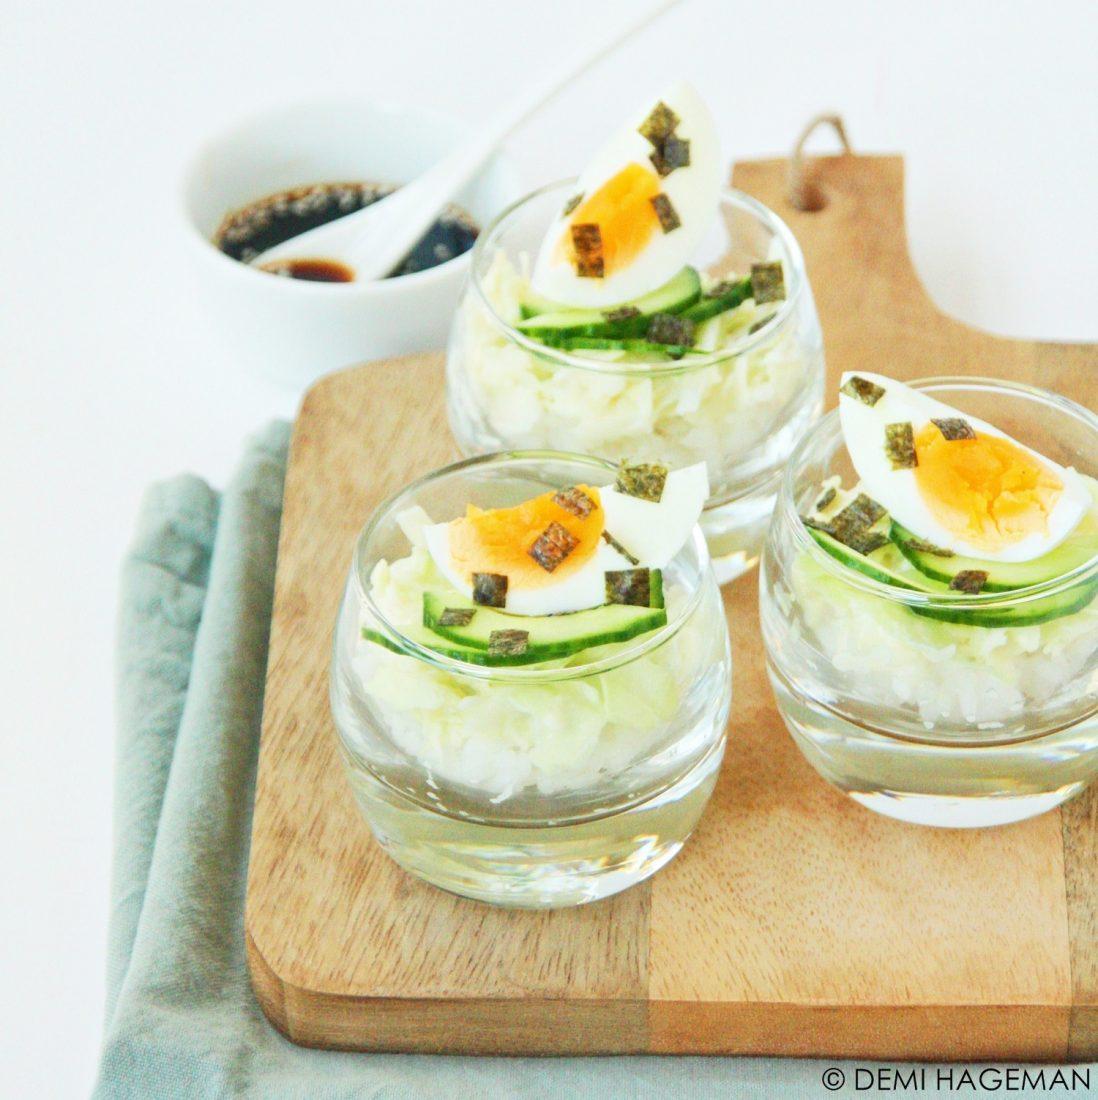 vegetarische sushi amuses met spitskool, wasabi en ei